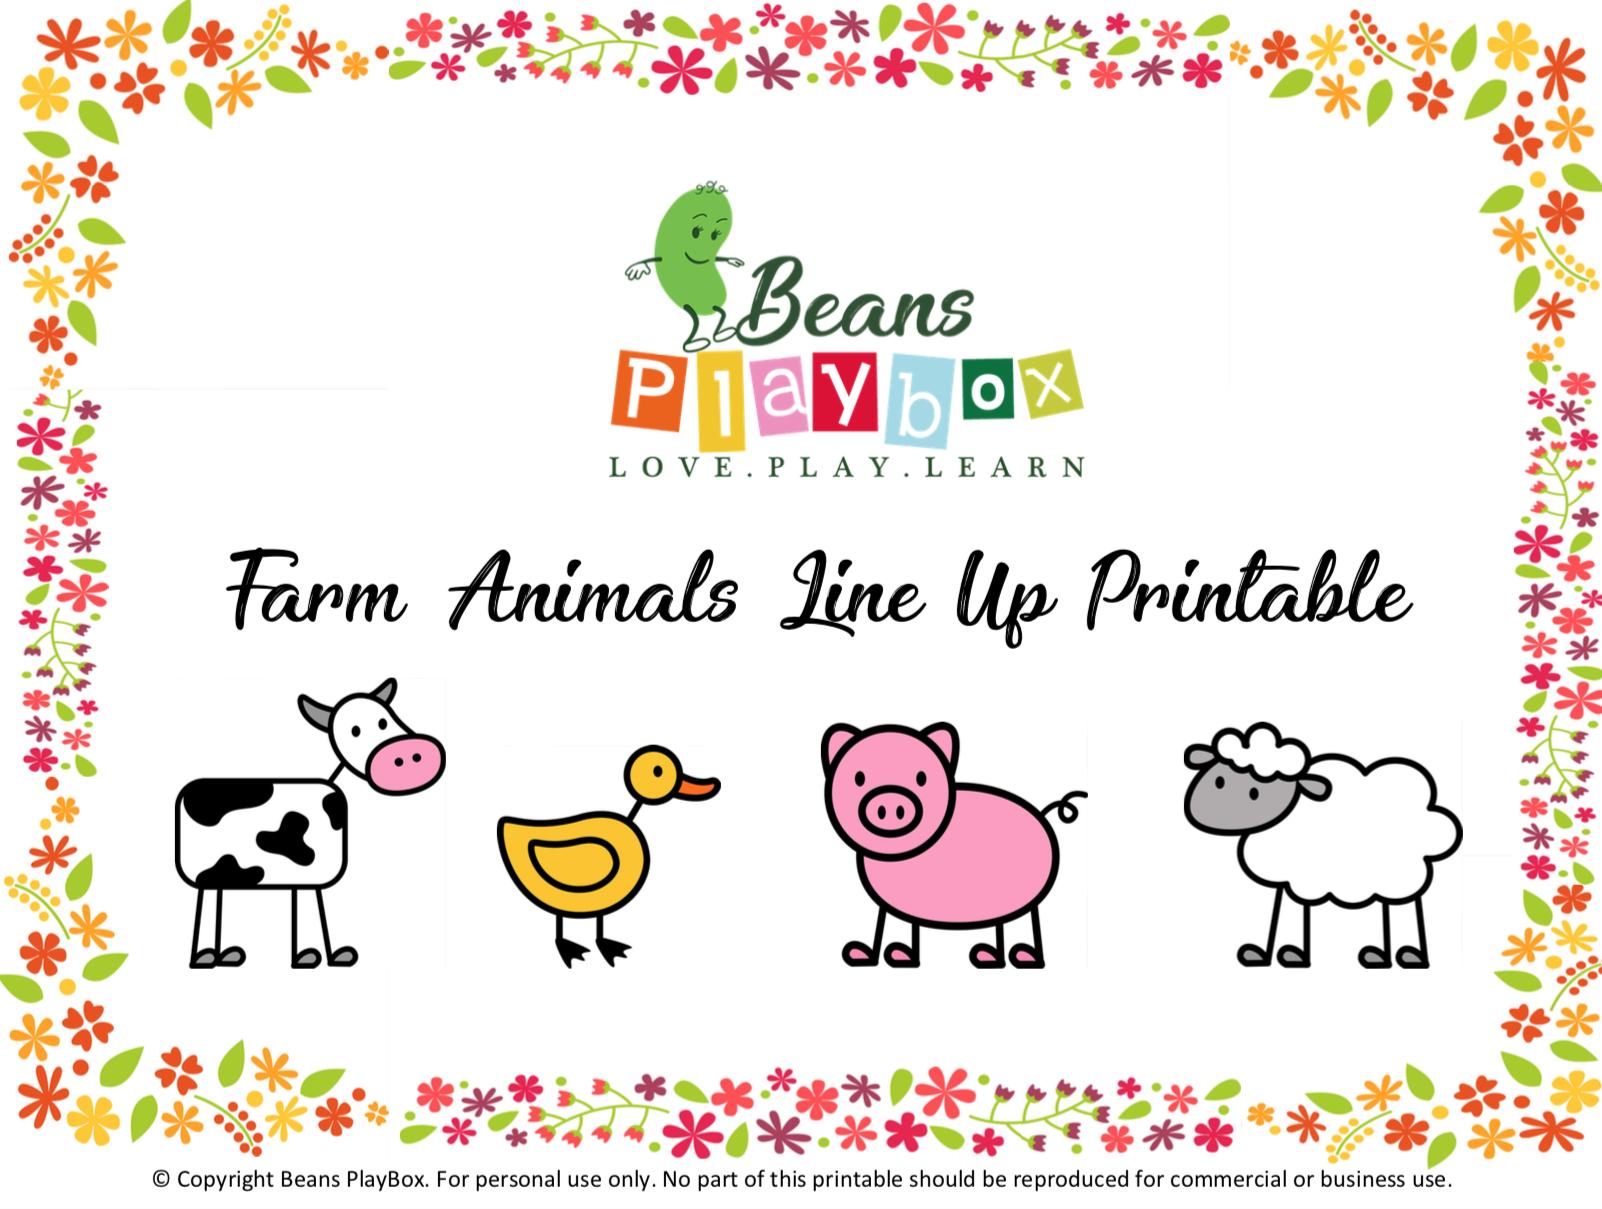 Farm Animal Printable, Free Printable, - Free Printable Farm Animals